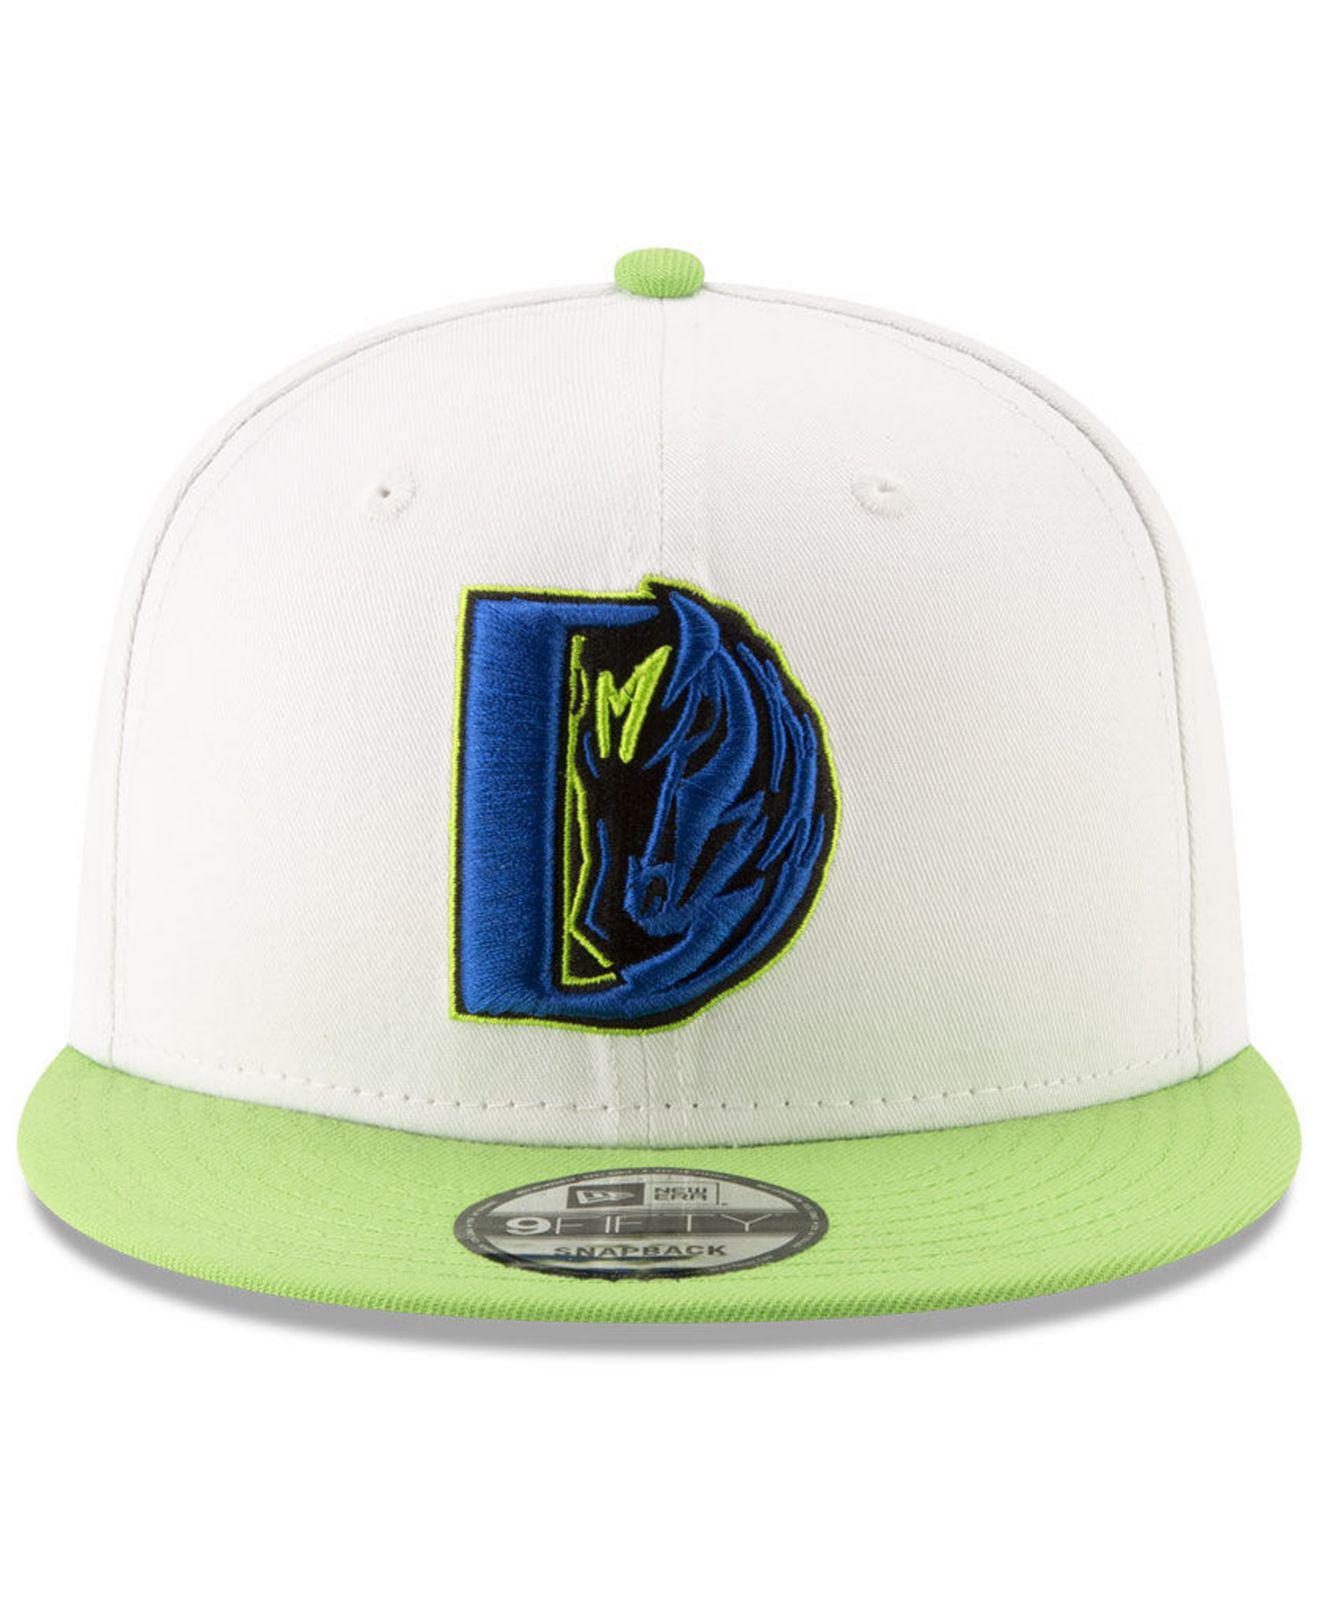 best website 6f22f b3688 ... 50% off lyst ktz dallas mavericks light city combo 9fifty snapback cap  for men ee4ee